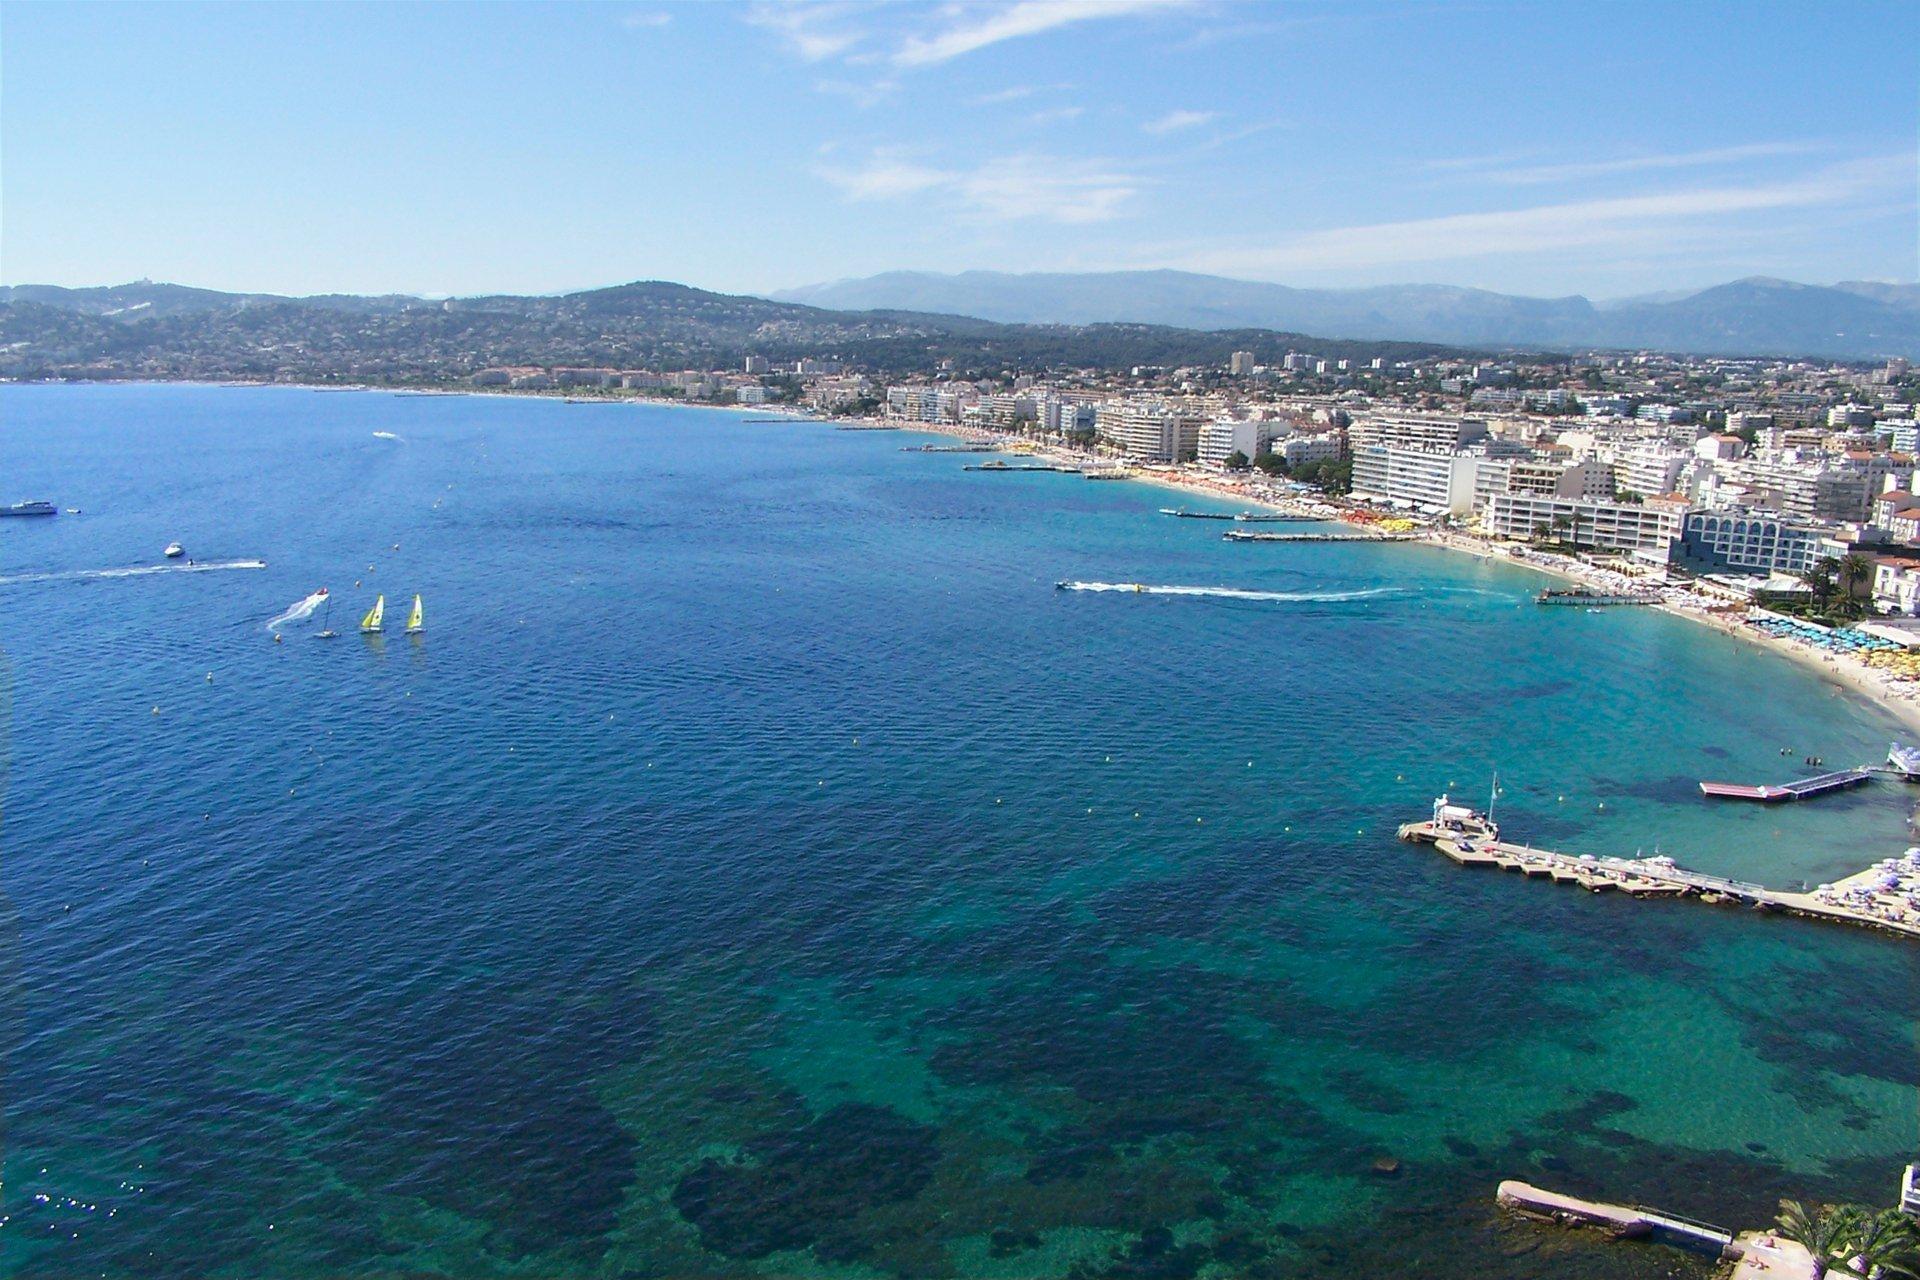 JUAN LES PINS - French Riviera - 3 bed apartment near beaches